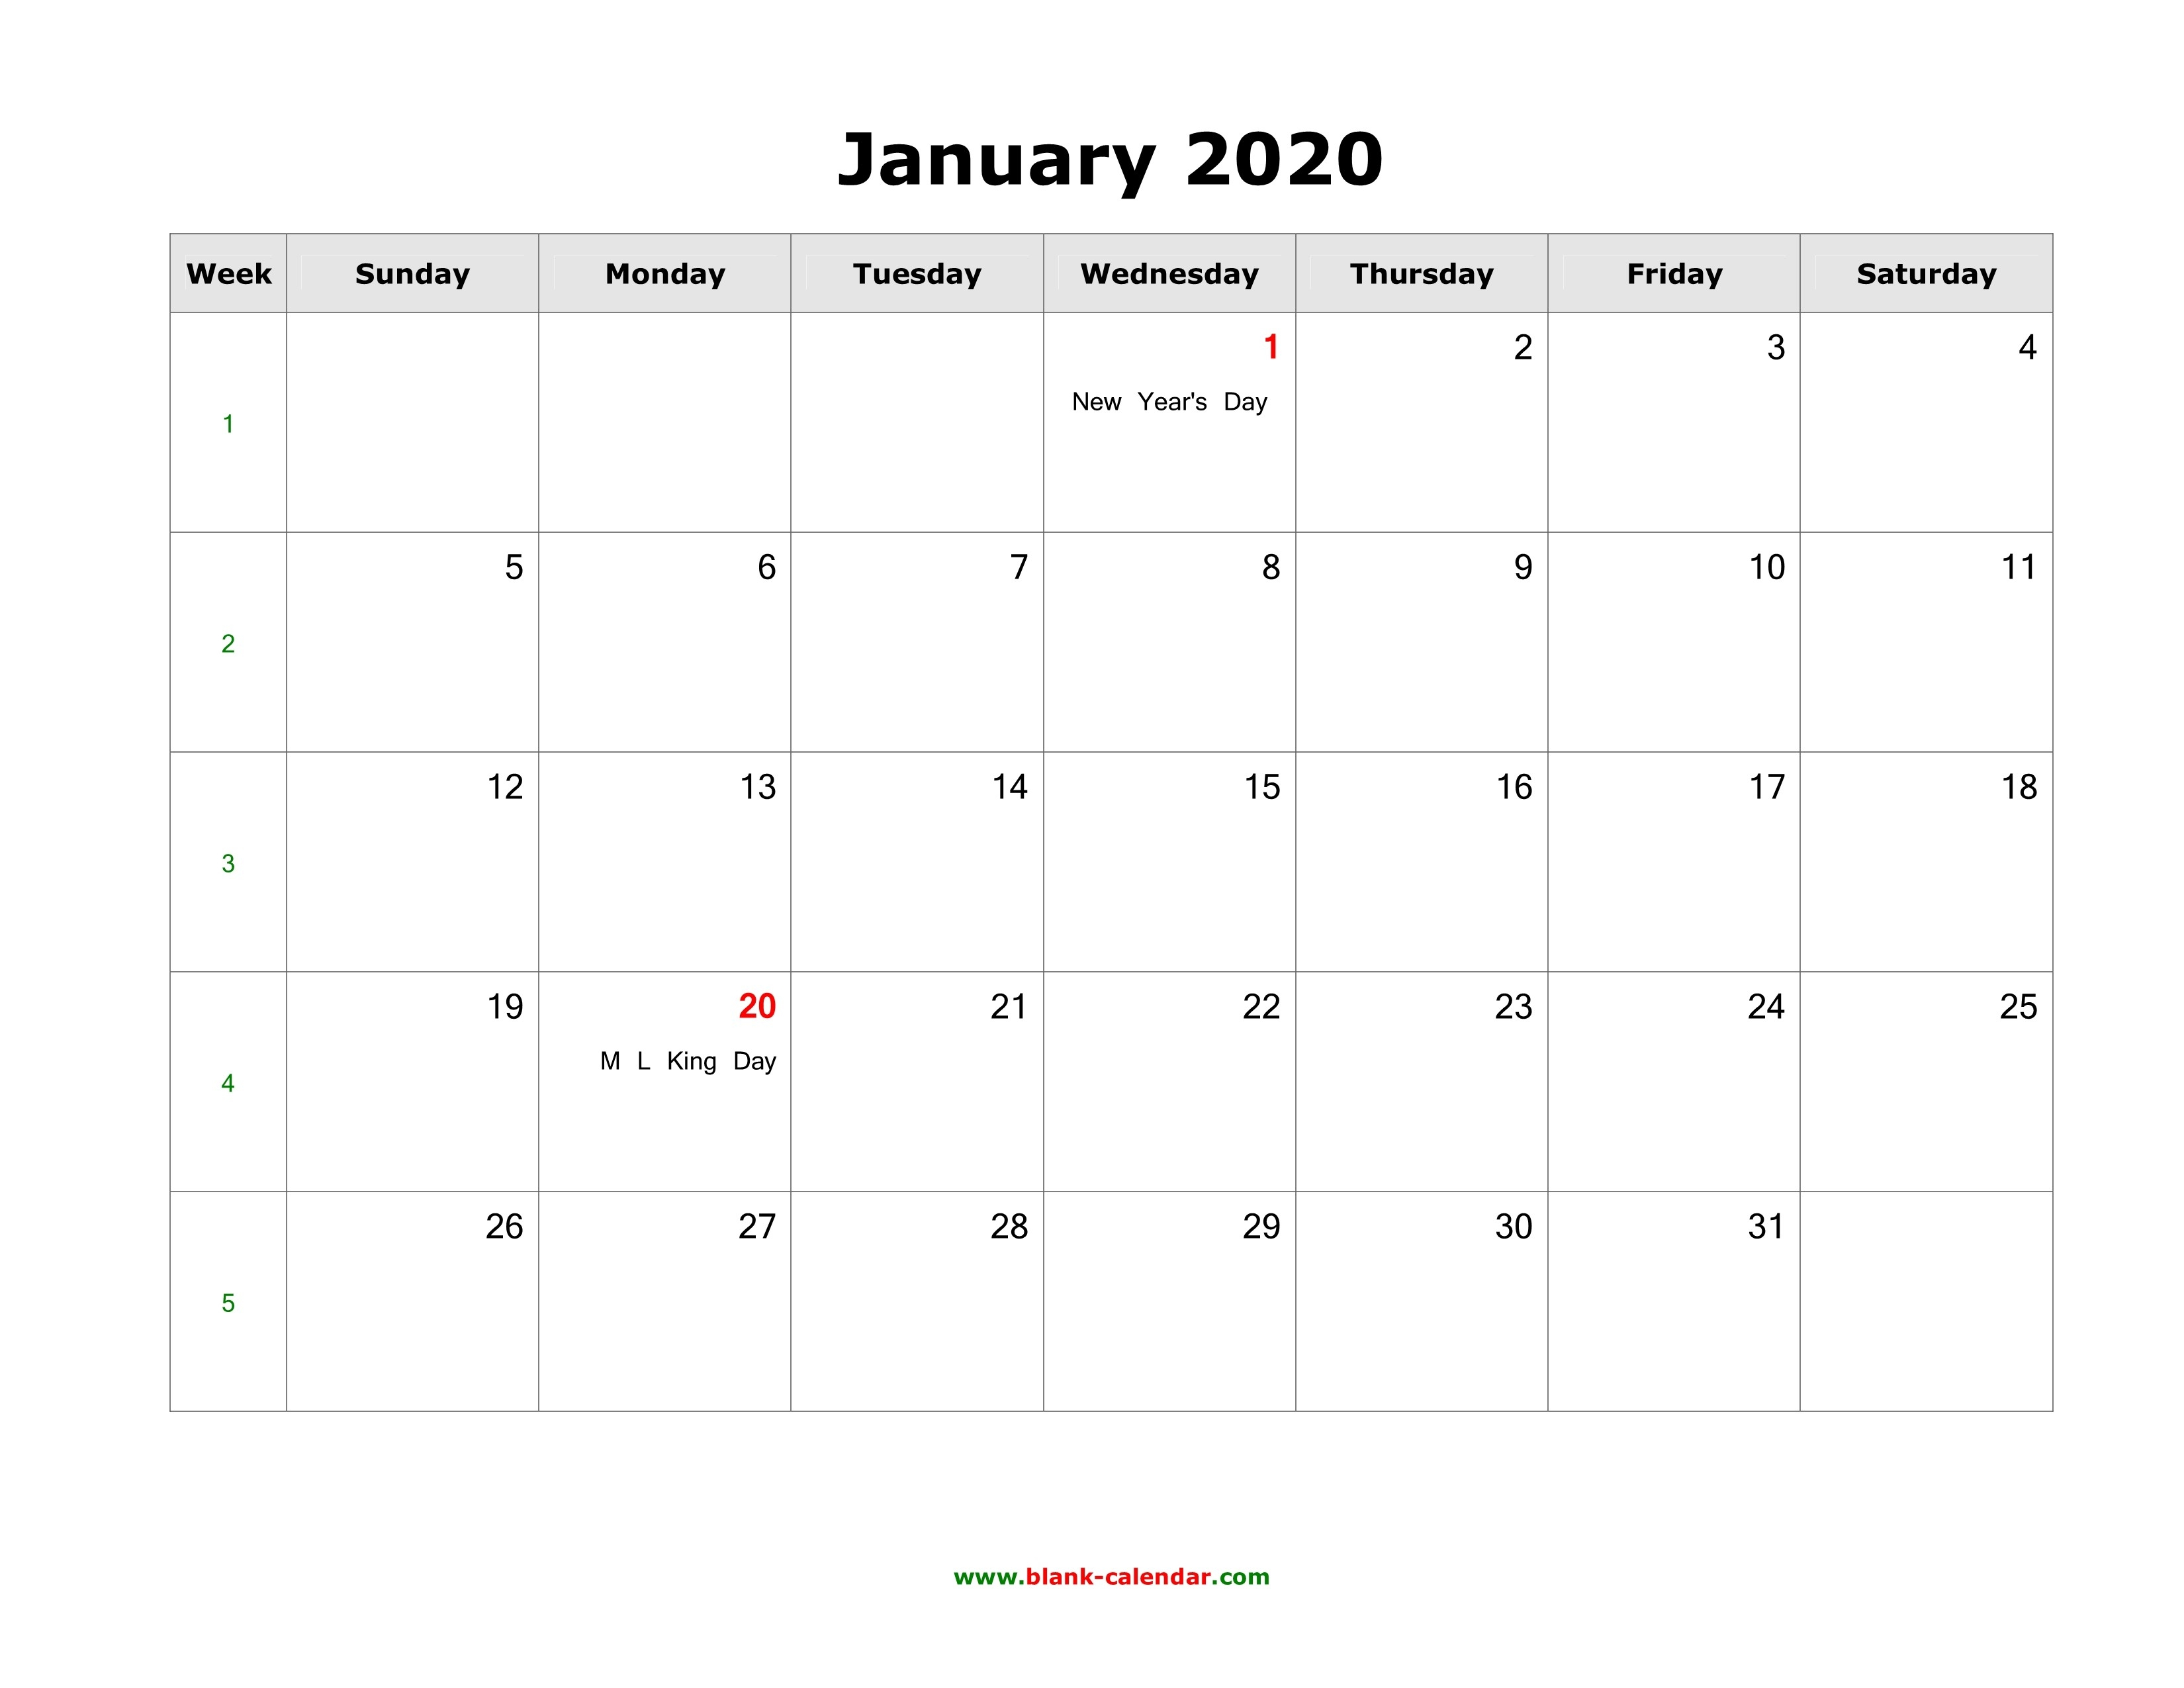 January 2020 Blank Calendar | Free Download Calendar Templates-January 2020 Calendar Editable